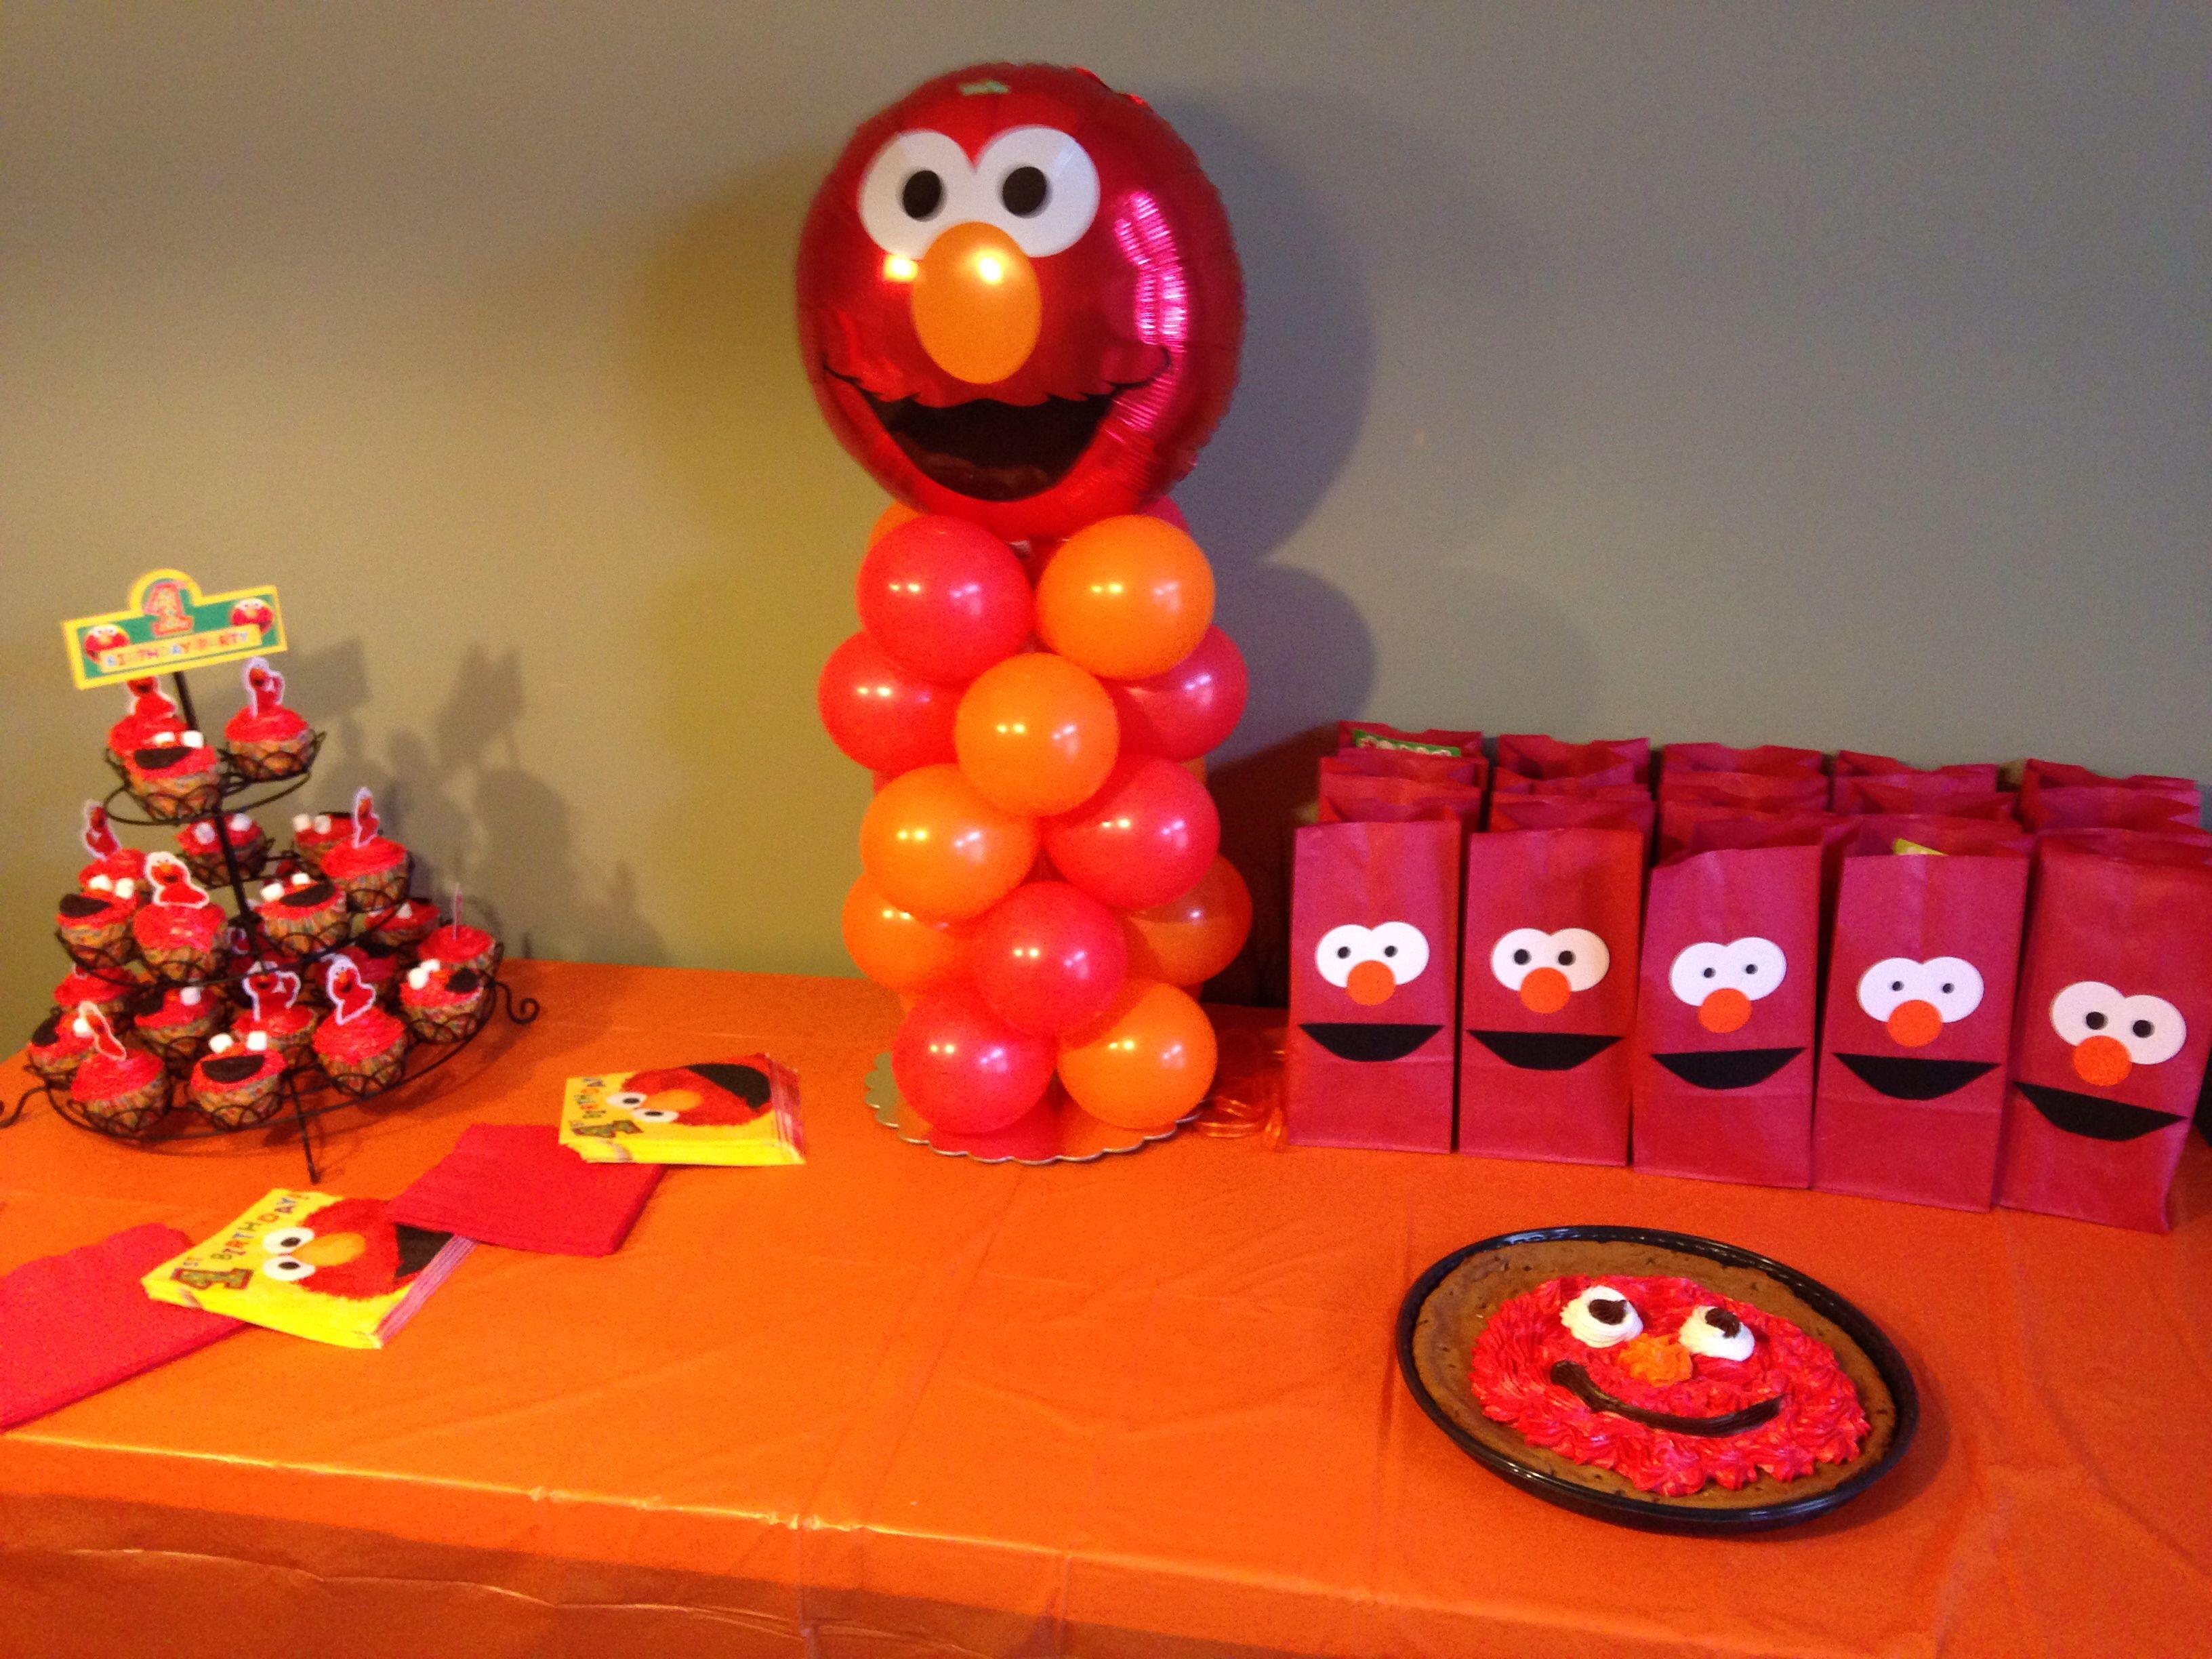 Pin By Ariel On Elmo Birthday Party Elmo Birthday Party Elmo Birthday Elmo Centerpieces